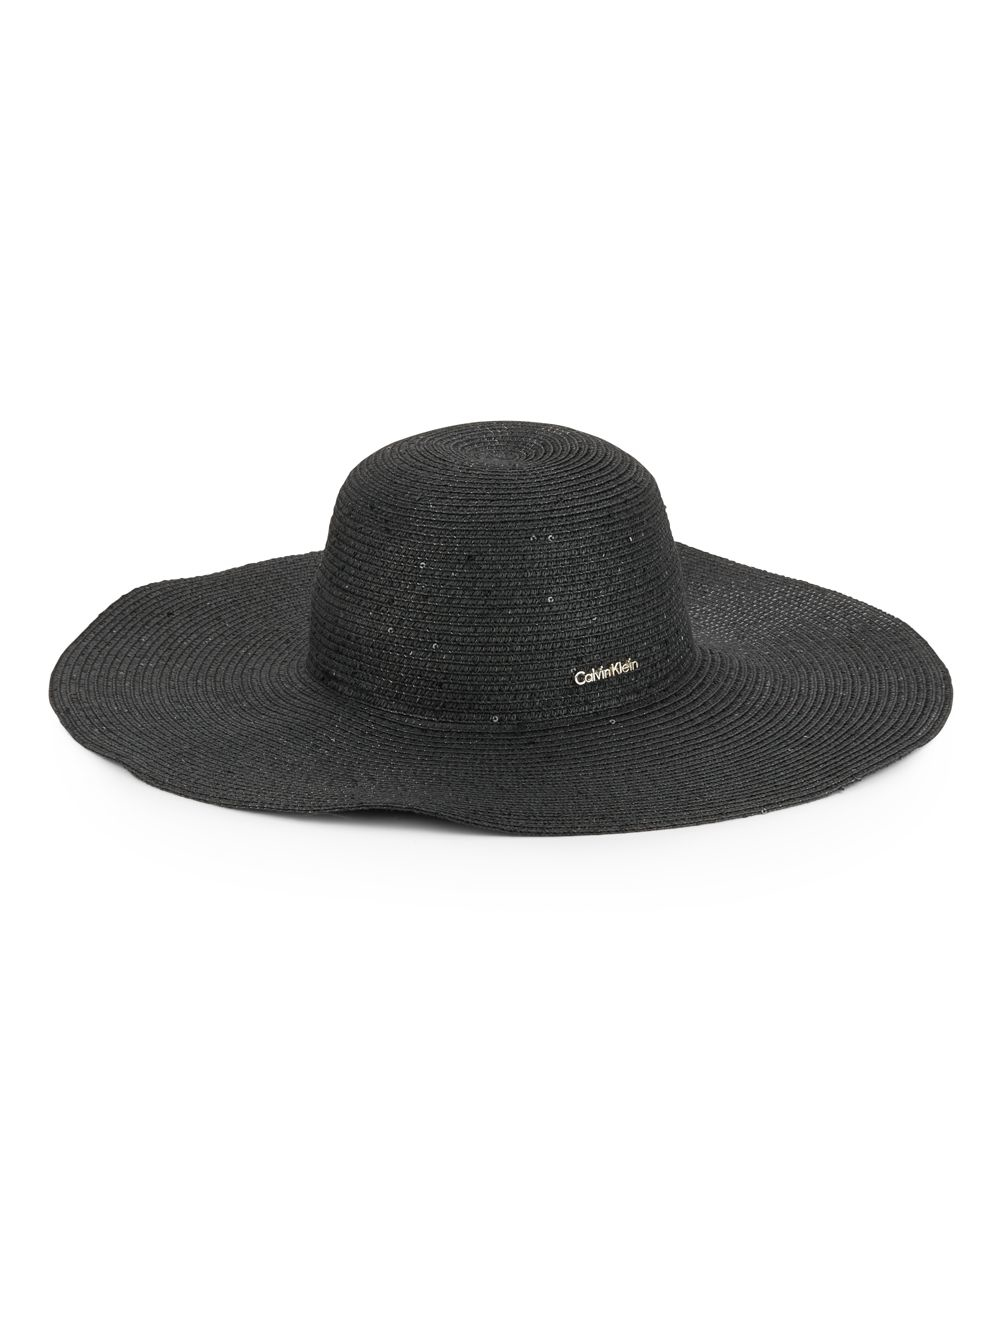 d131c767 Calvin Klein Sequined Sun Hat in Black - Lyst